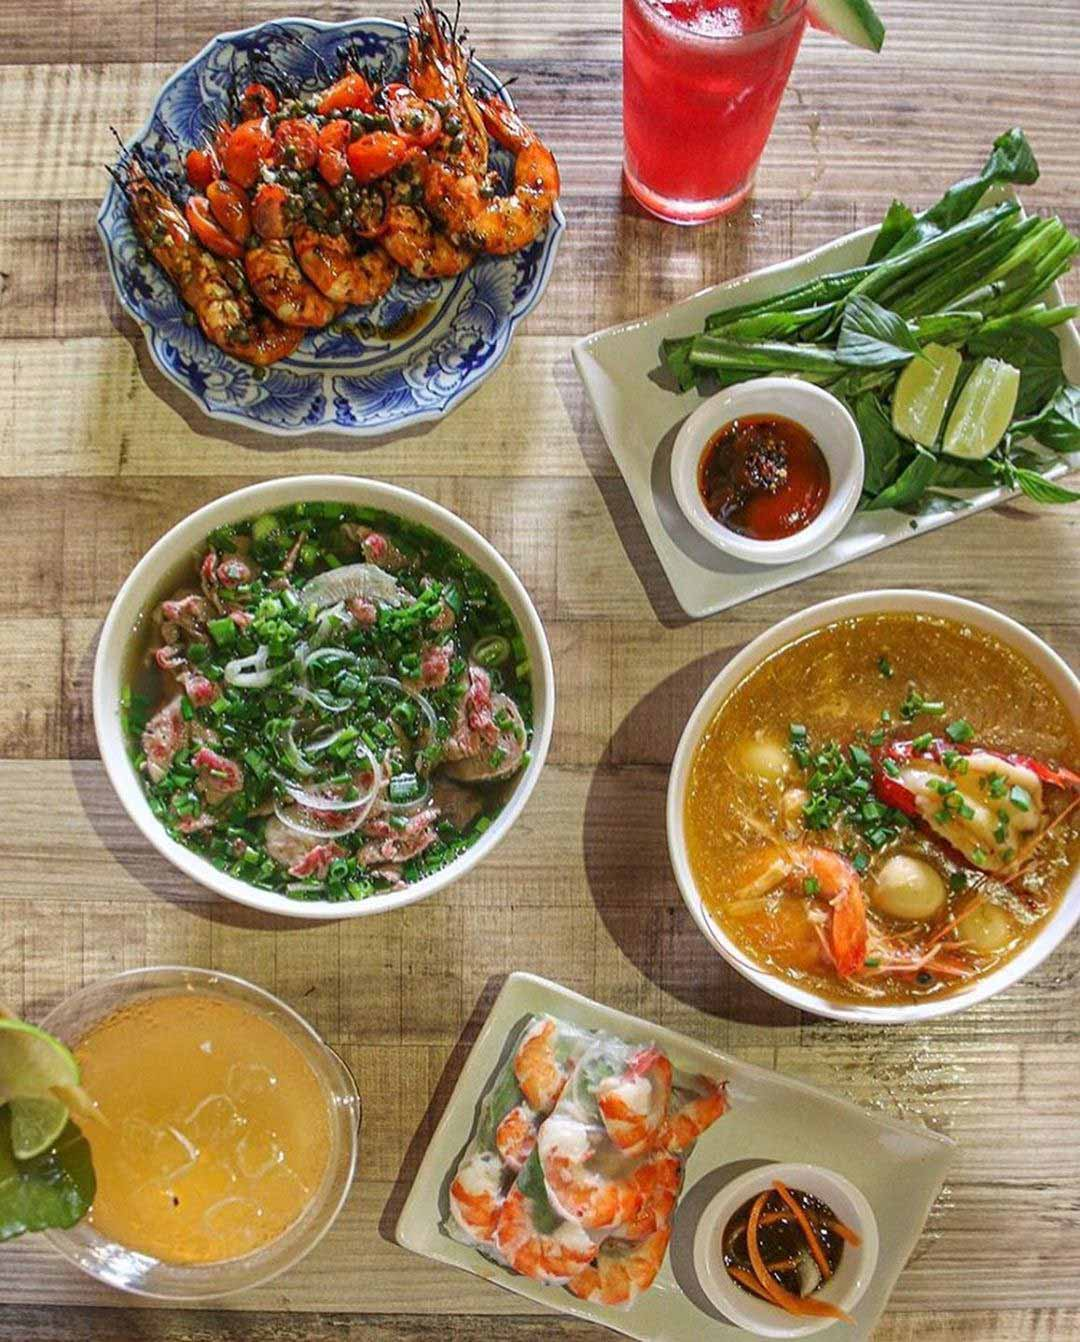 Dempsey Hil Restaurants - Red Sparrow food